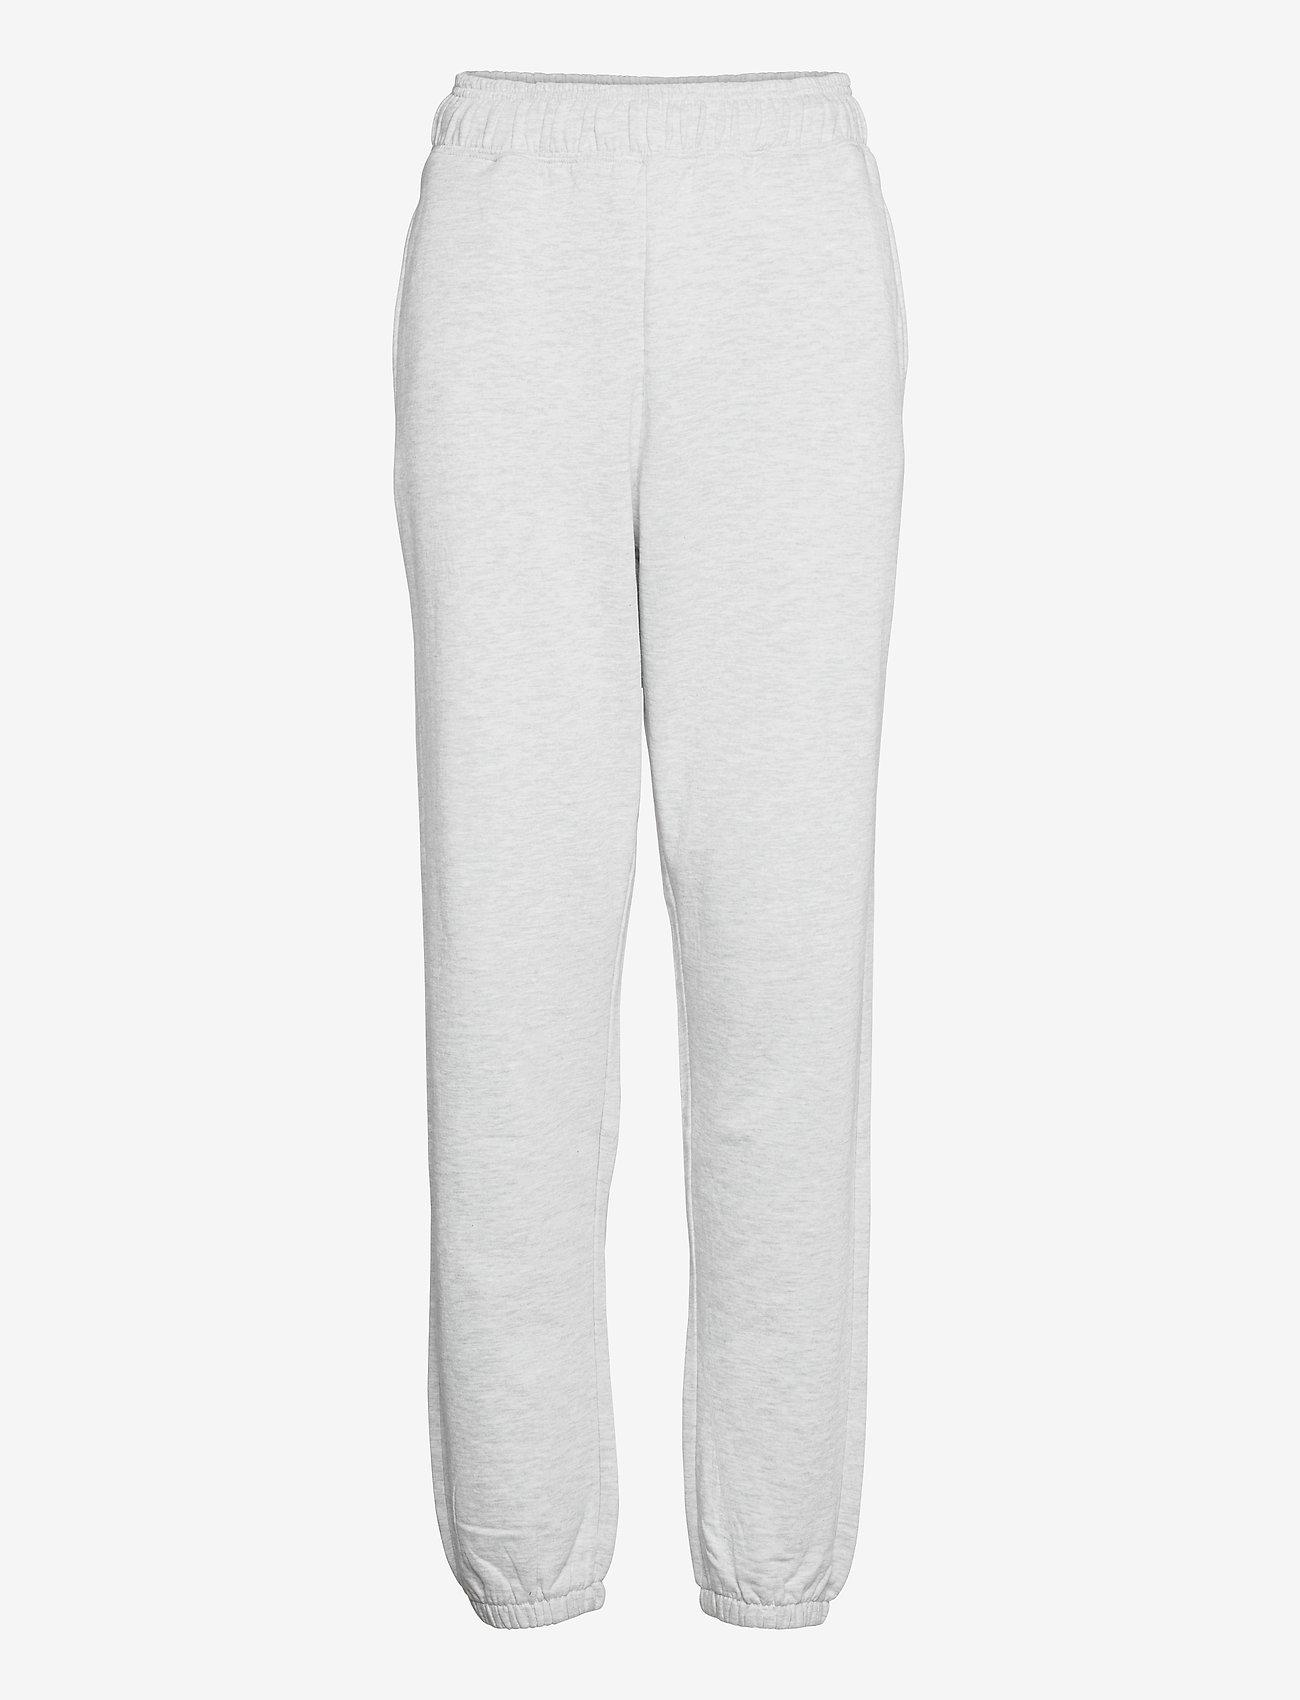 Vero Moda - VMODEZ HW SWEAT PANTS VMA - kläder - light grey melange - 0